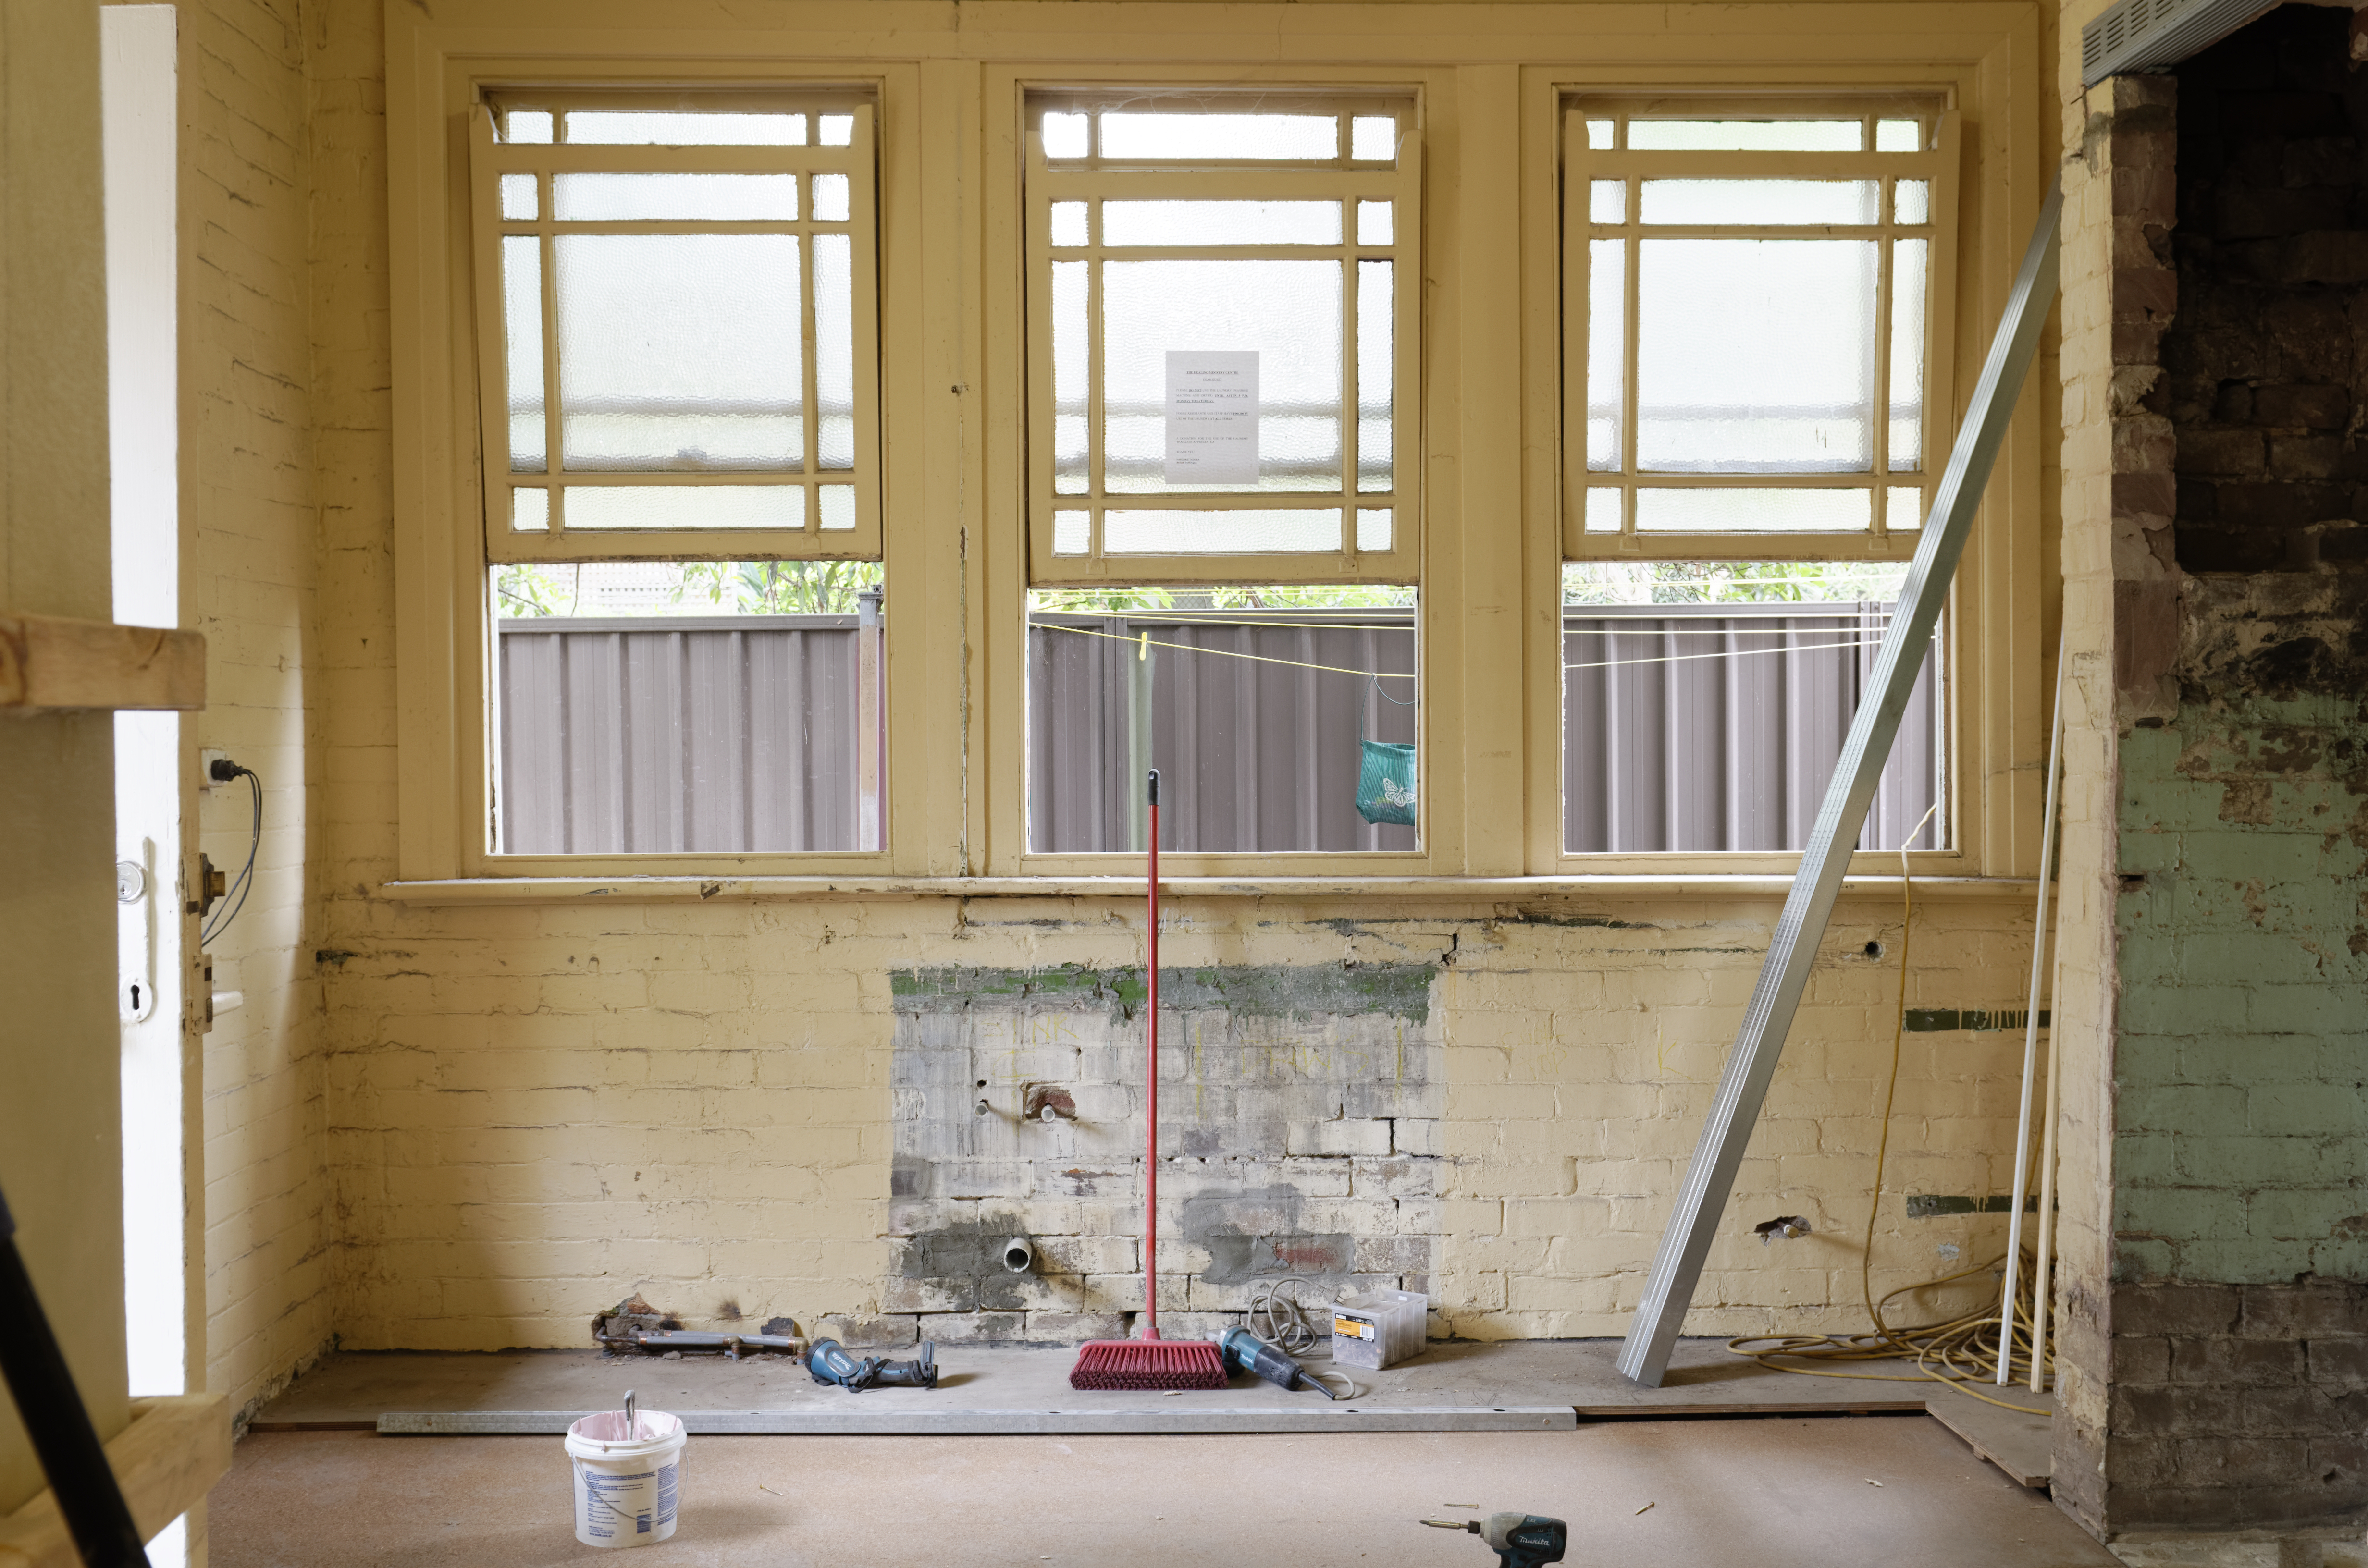 3 Tips To Avoid Asbestos Exposure While Remodeling And Repairing Older Buildings